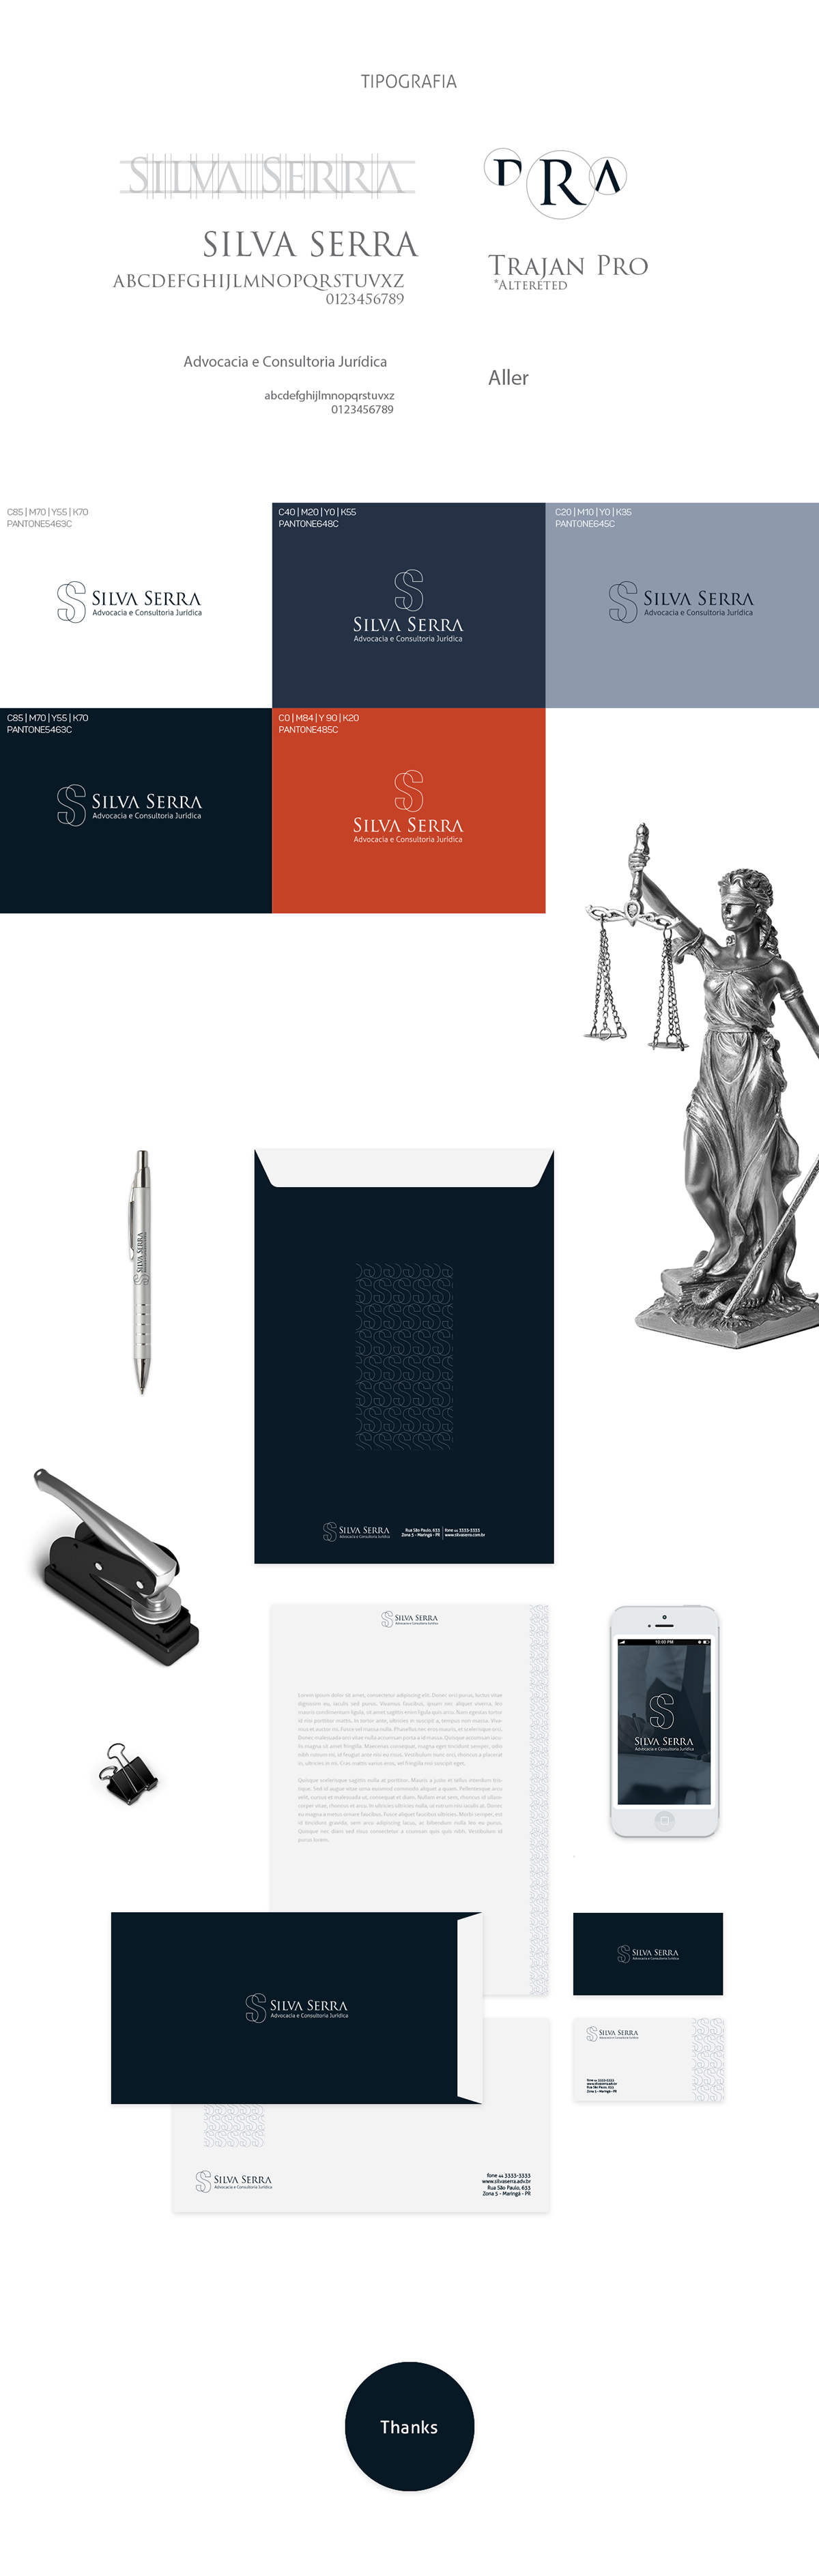 branding  marca Law Office escritório de direito advogado lawyer Juridico legal Construção de Marca Justice